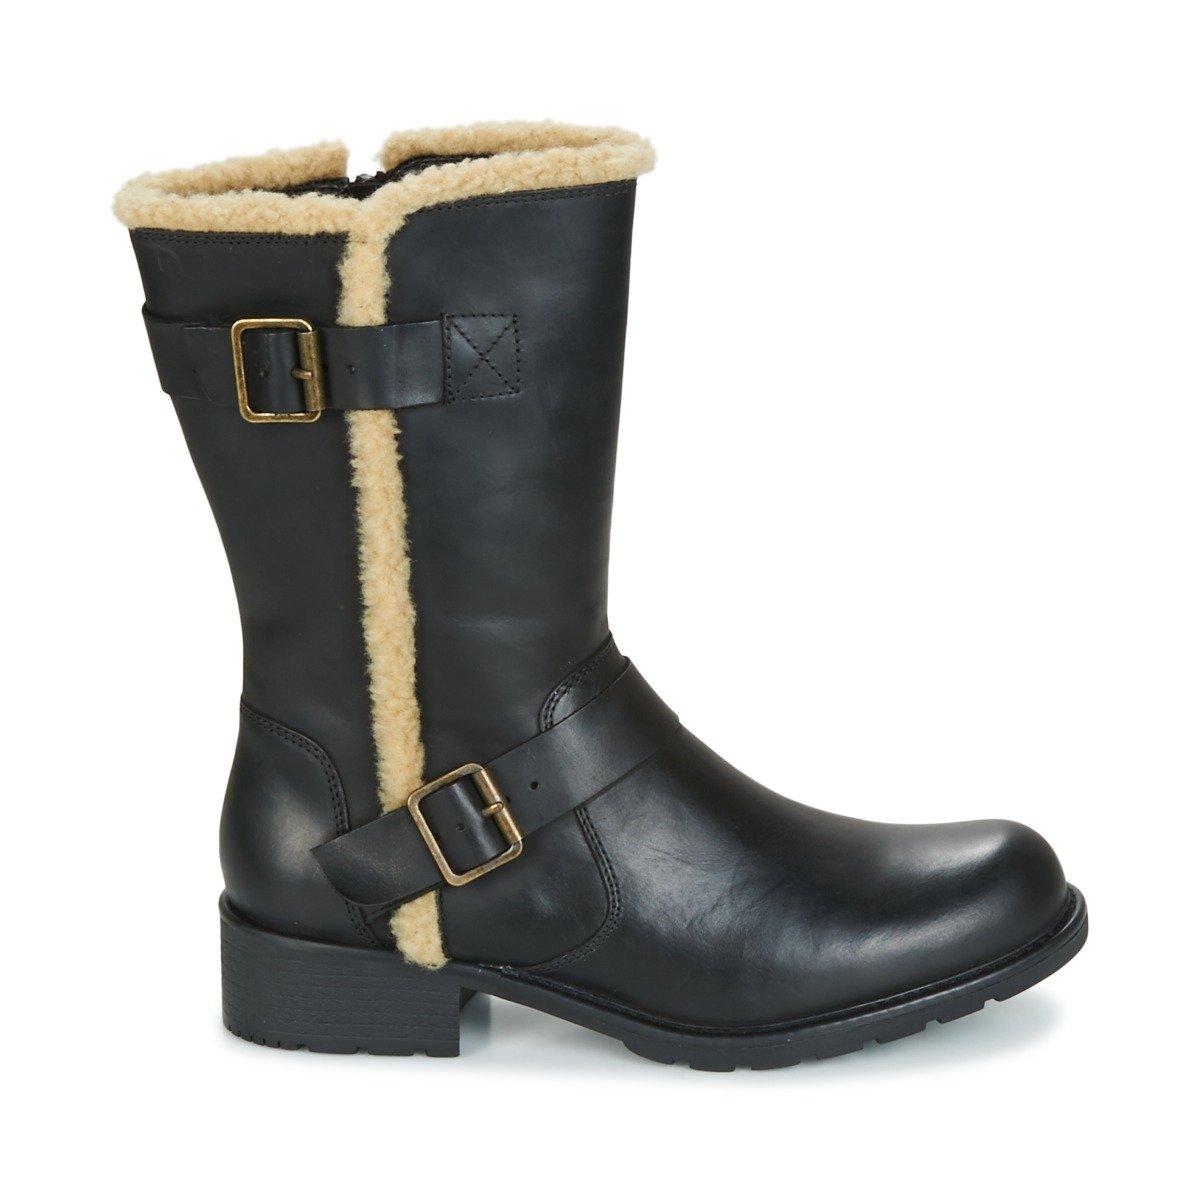 6 WideAmazon Leather Clarks Orinoco Black Womens 5 Boots Us Art ZuPikTOX